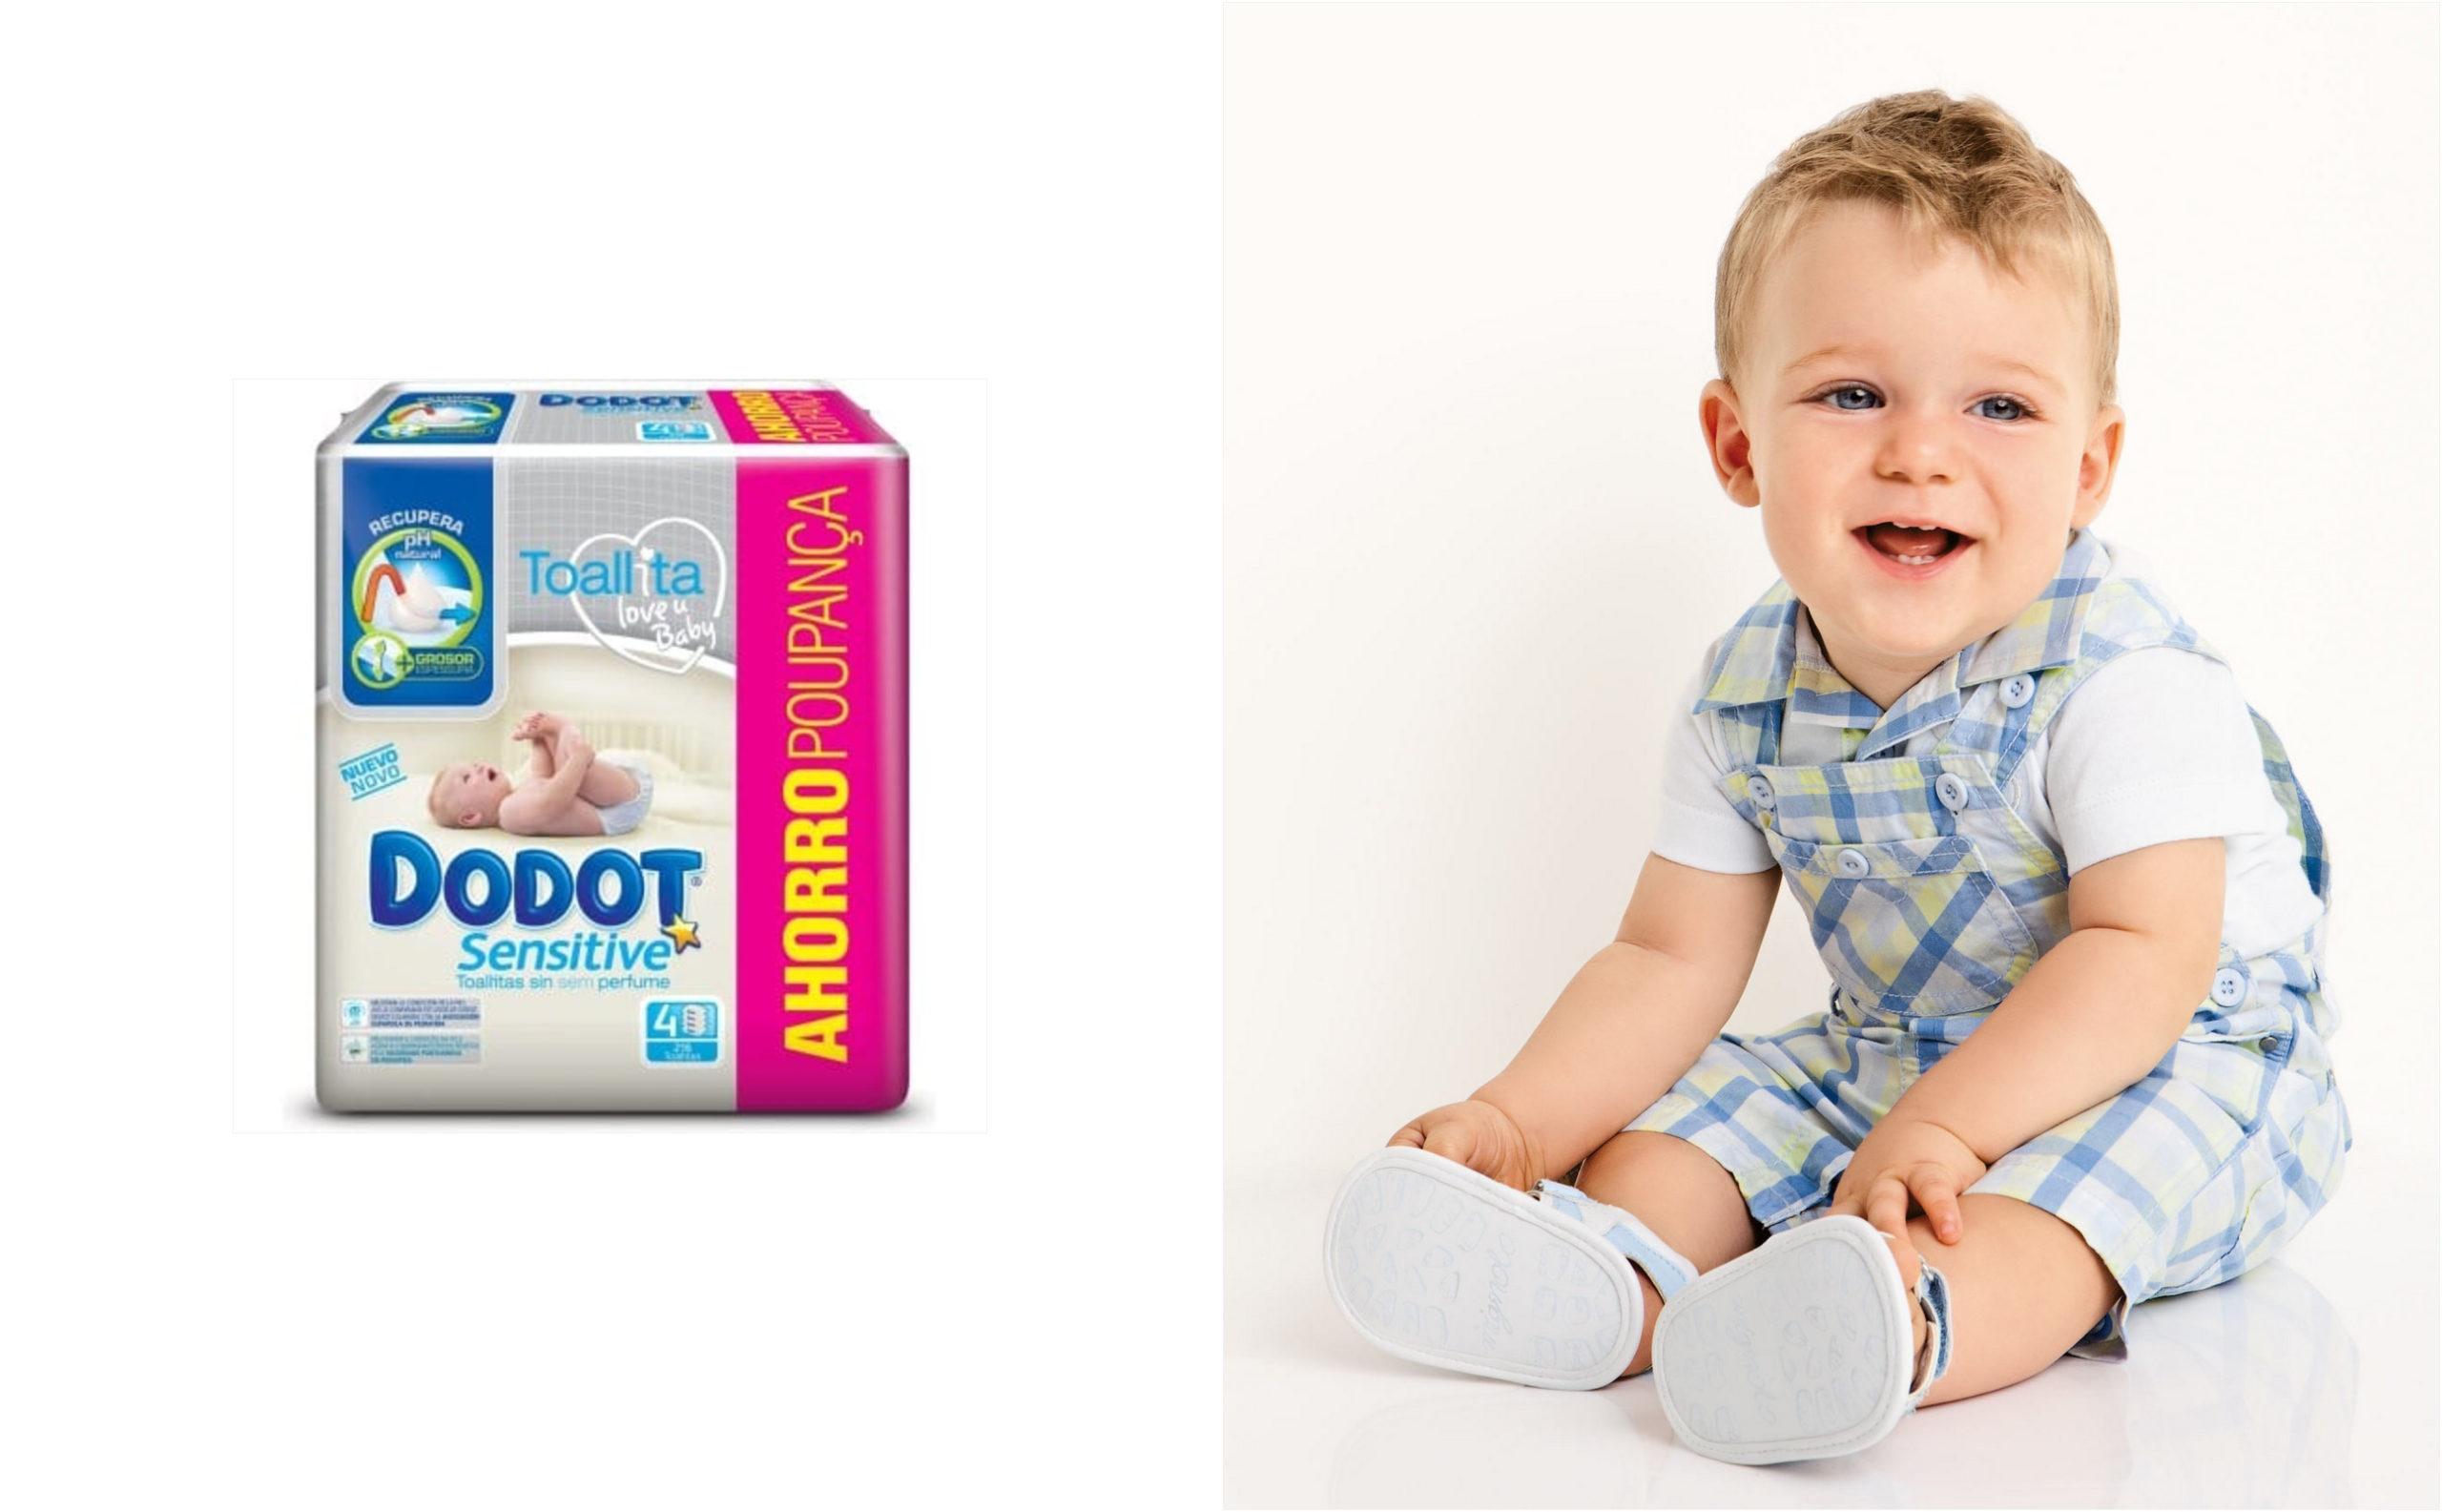 NOWAYTOSTART Dispensador de toallitas para beb/és Calentador de toallitas humedas Bebe Caja de toallitas h/úmedas para beb/és toallitas Calientes para beb/és,termostato port/átil